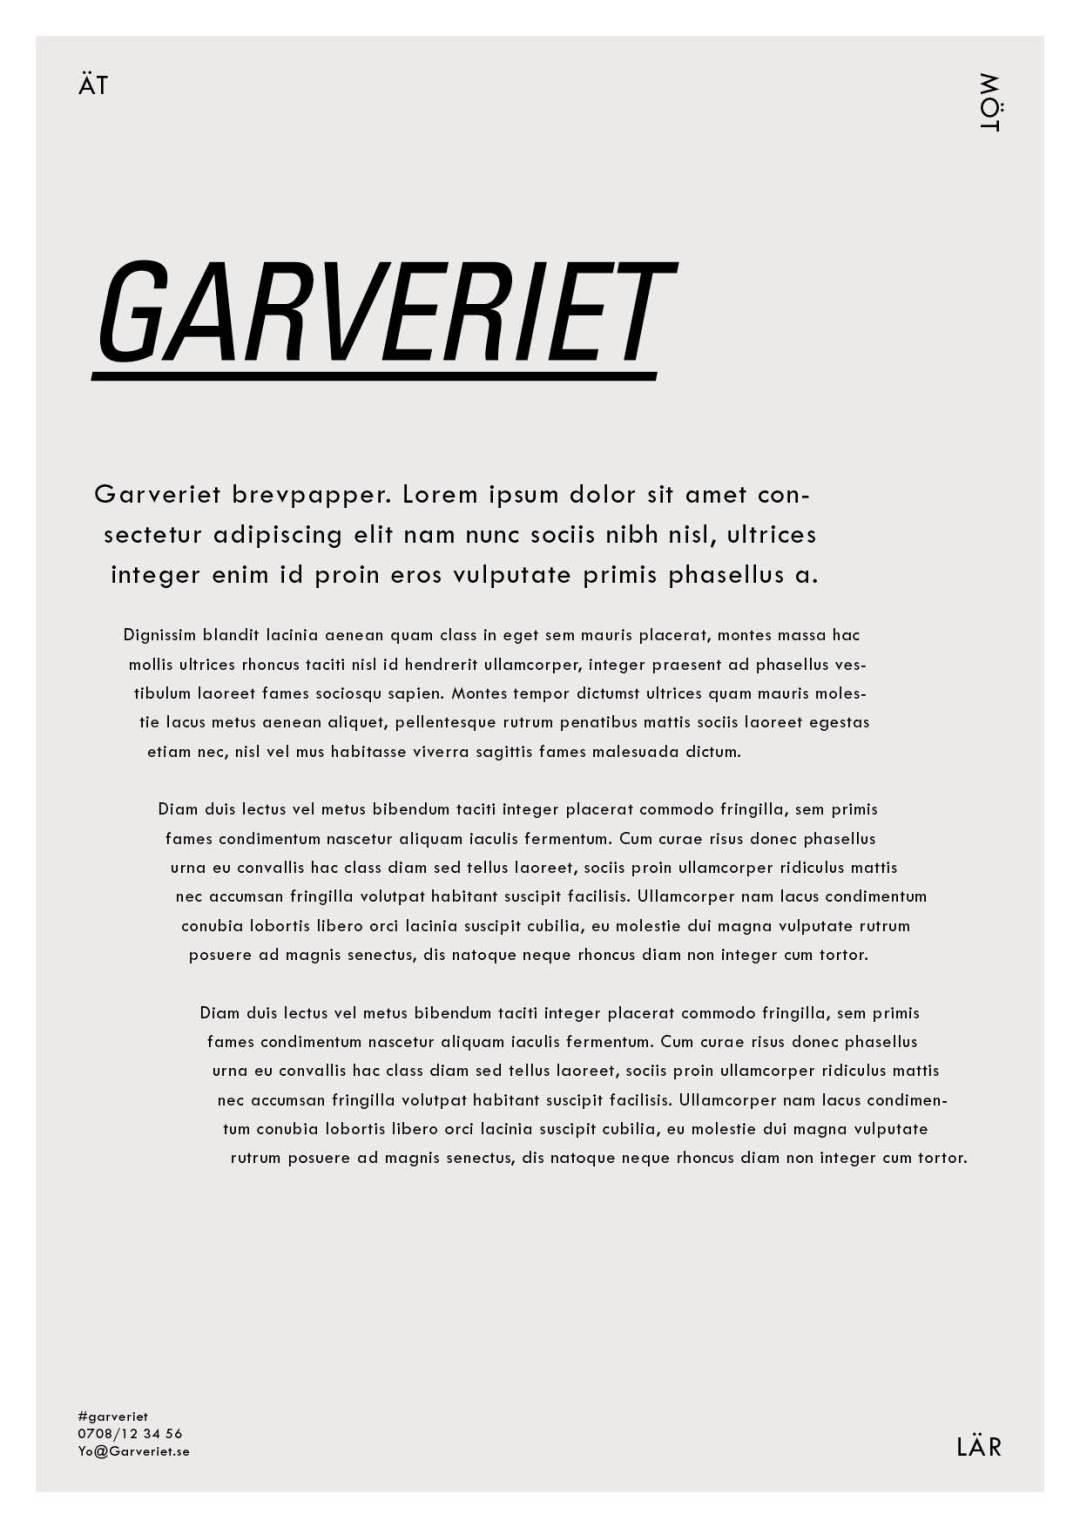 grafisk-profil-garveriet-201817